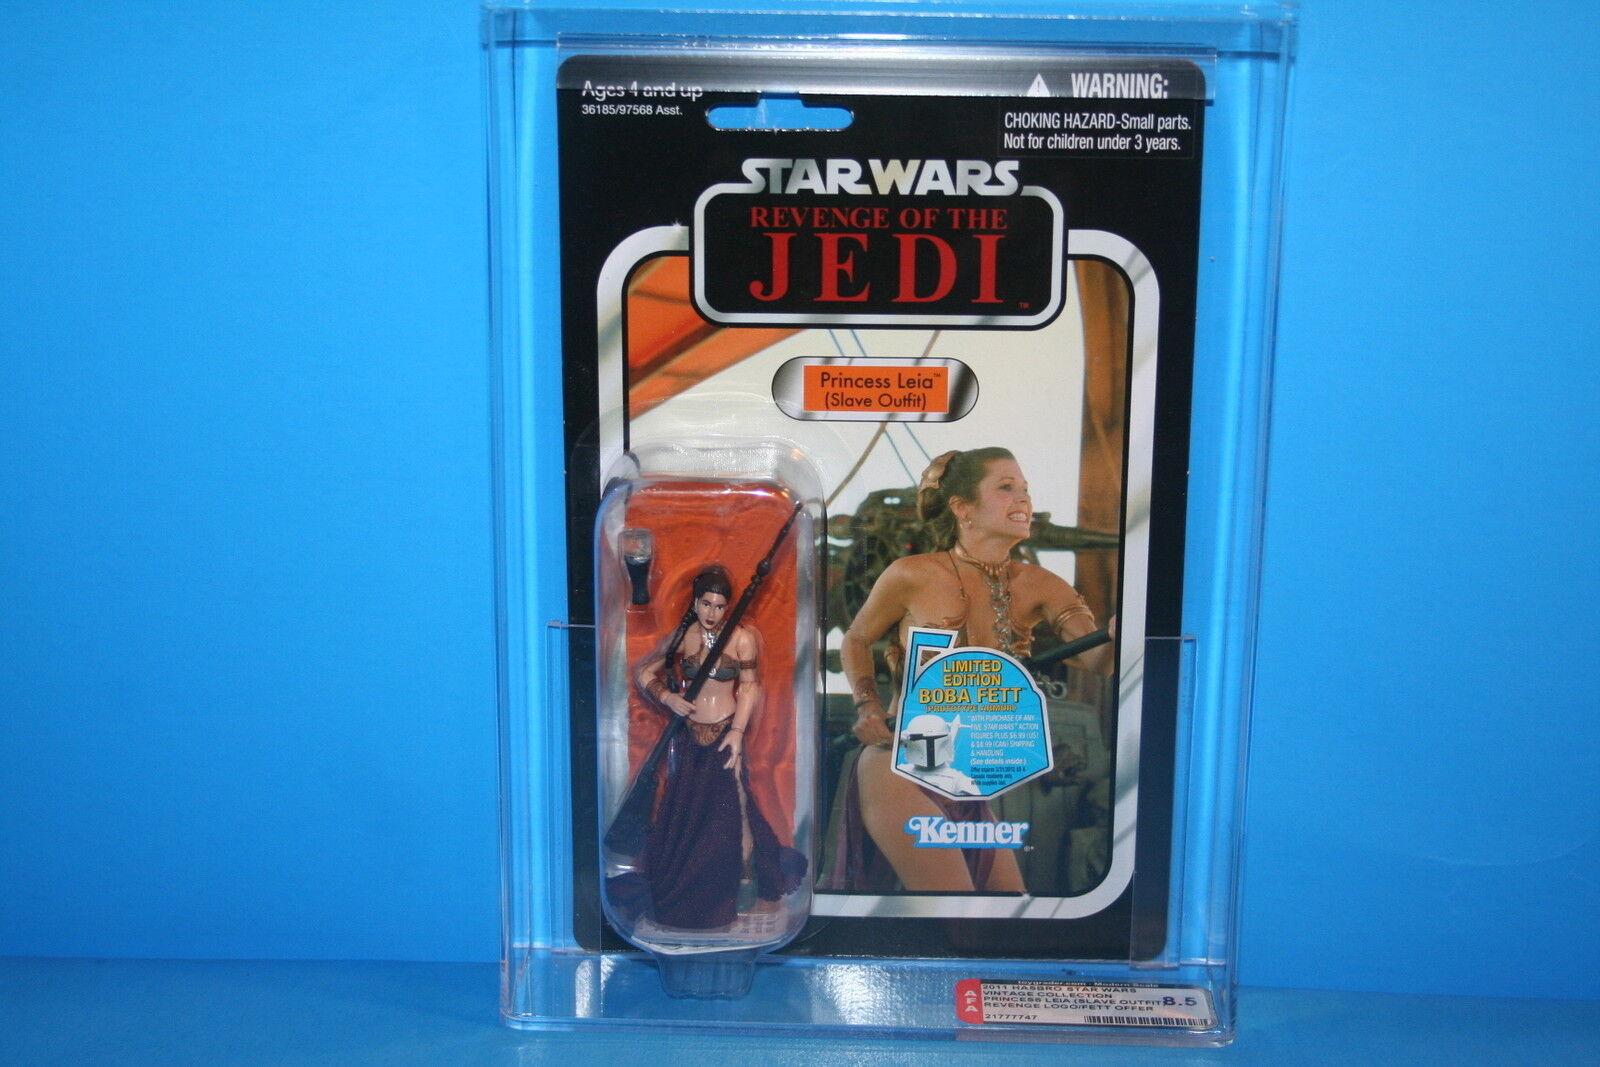 Star Wars Afa clasificados 2011 Tvc menta en tarjeta figura Esclava Leia  la venganza  Logo 8.5